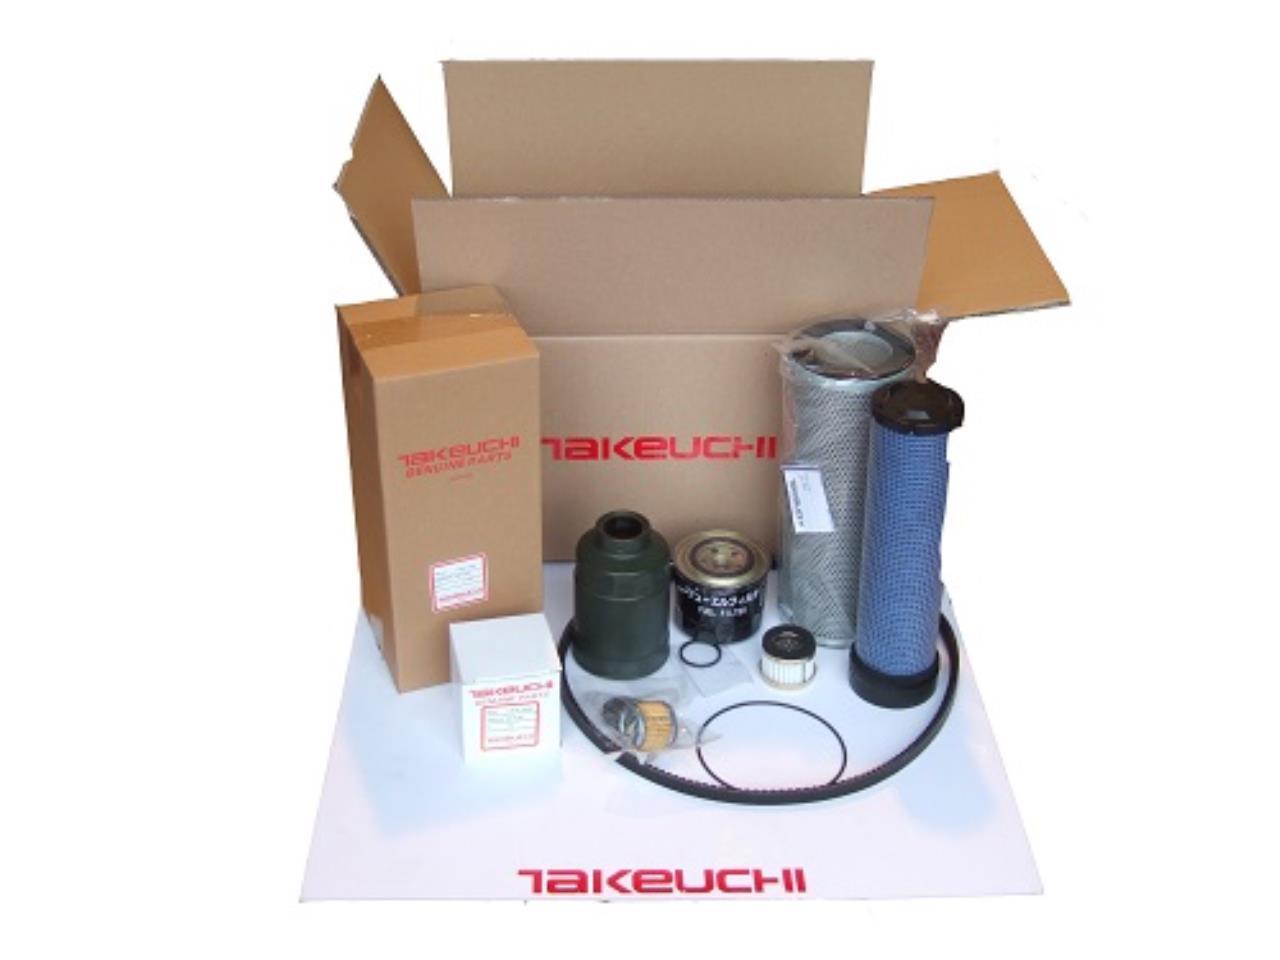 Takeuchi TB230 filtersæt